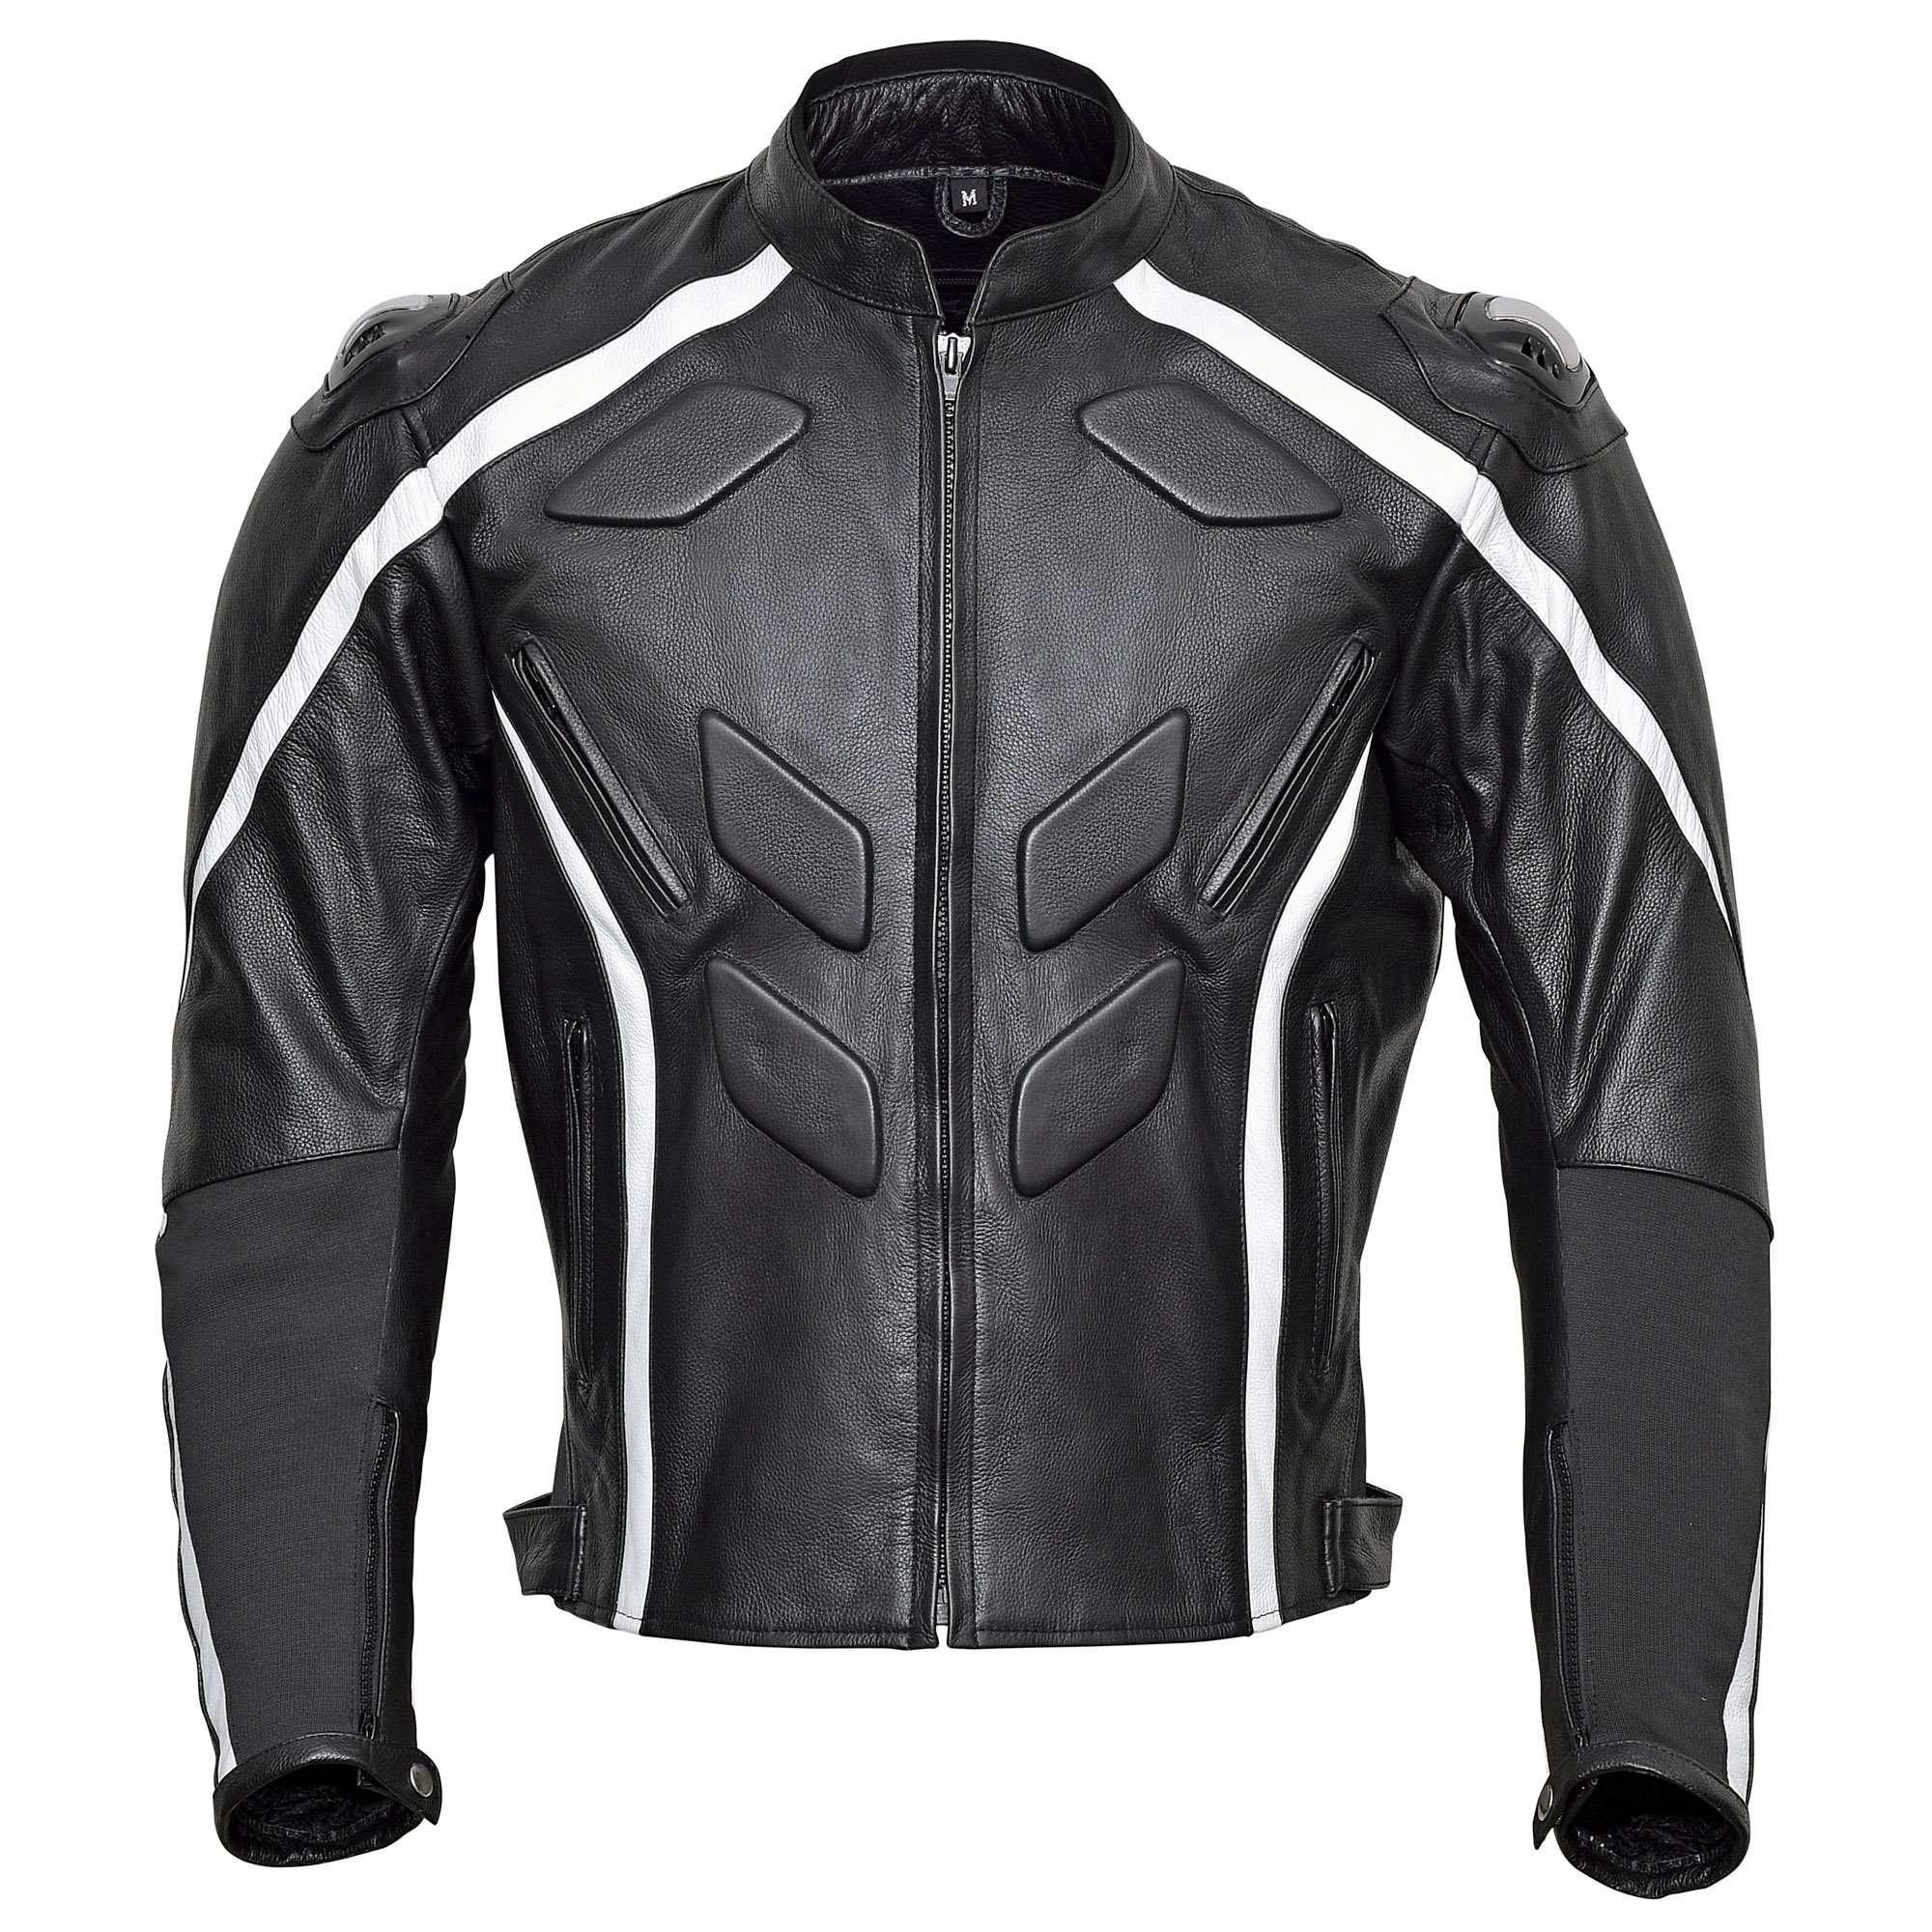 Excalibur-Mens-Race-Leather-Motorcycle-Jacket